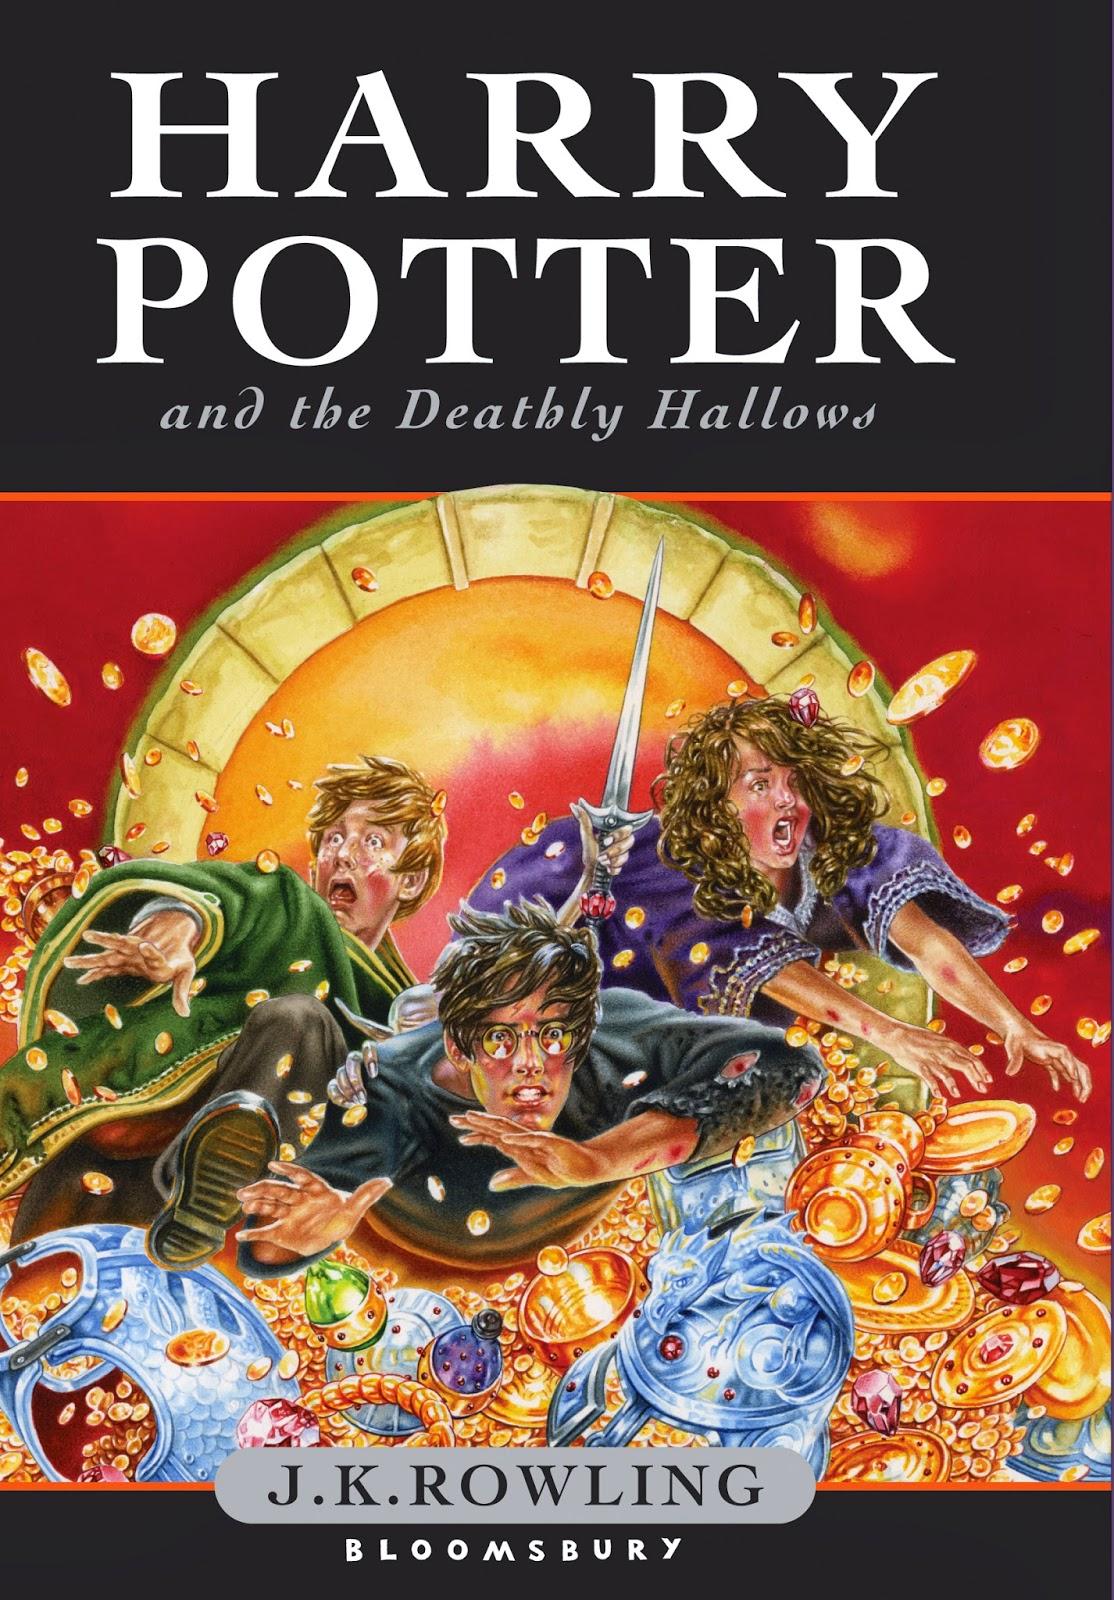 https://www.goodreads.com/series/45175-harry-potter